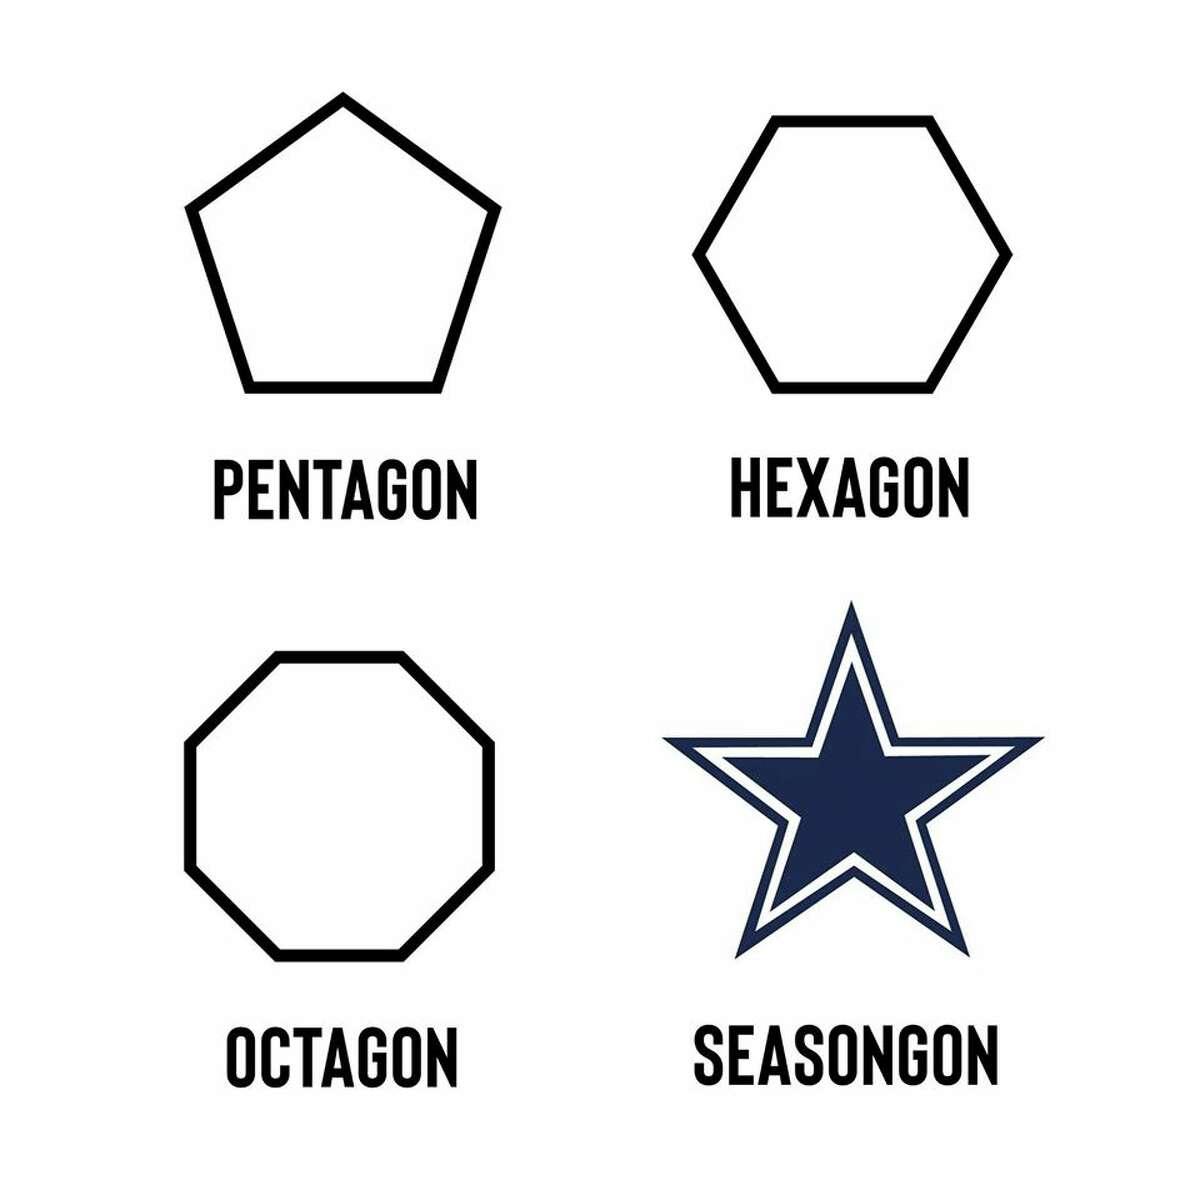 Hilarious Memes Ridicule End Of Dallas Cowboys Season